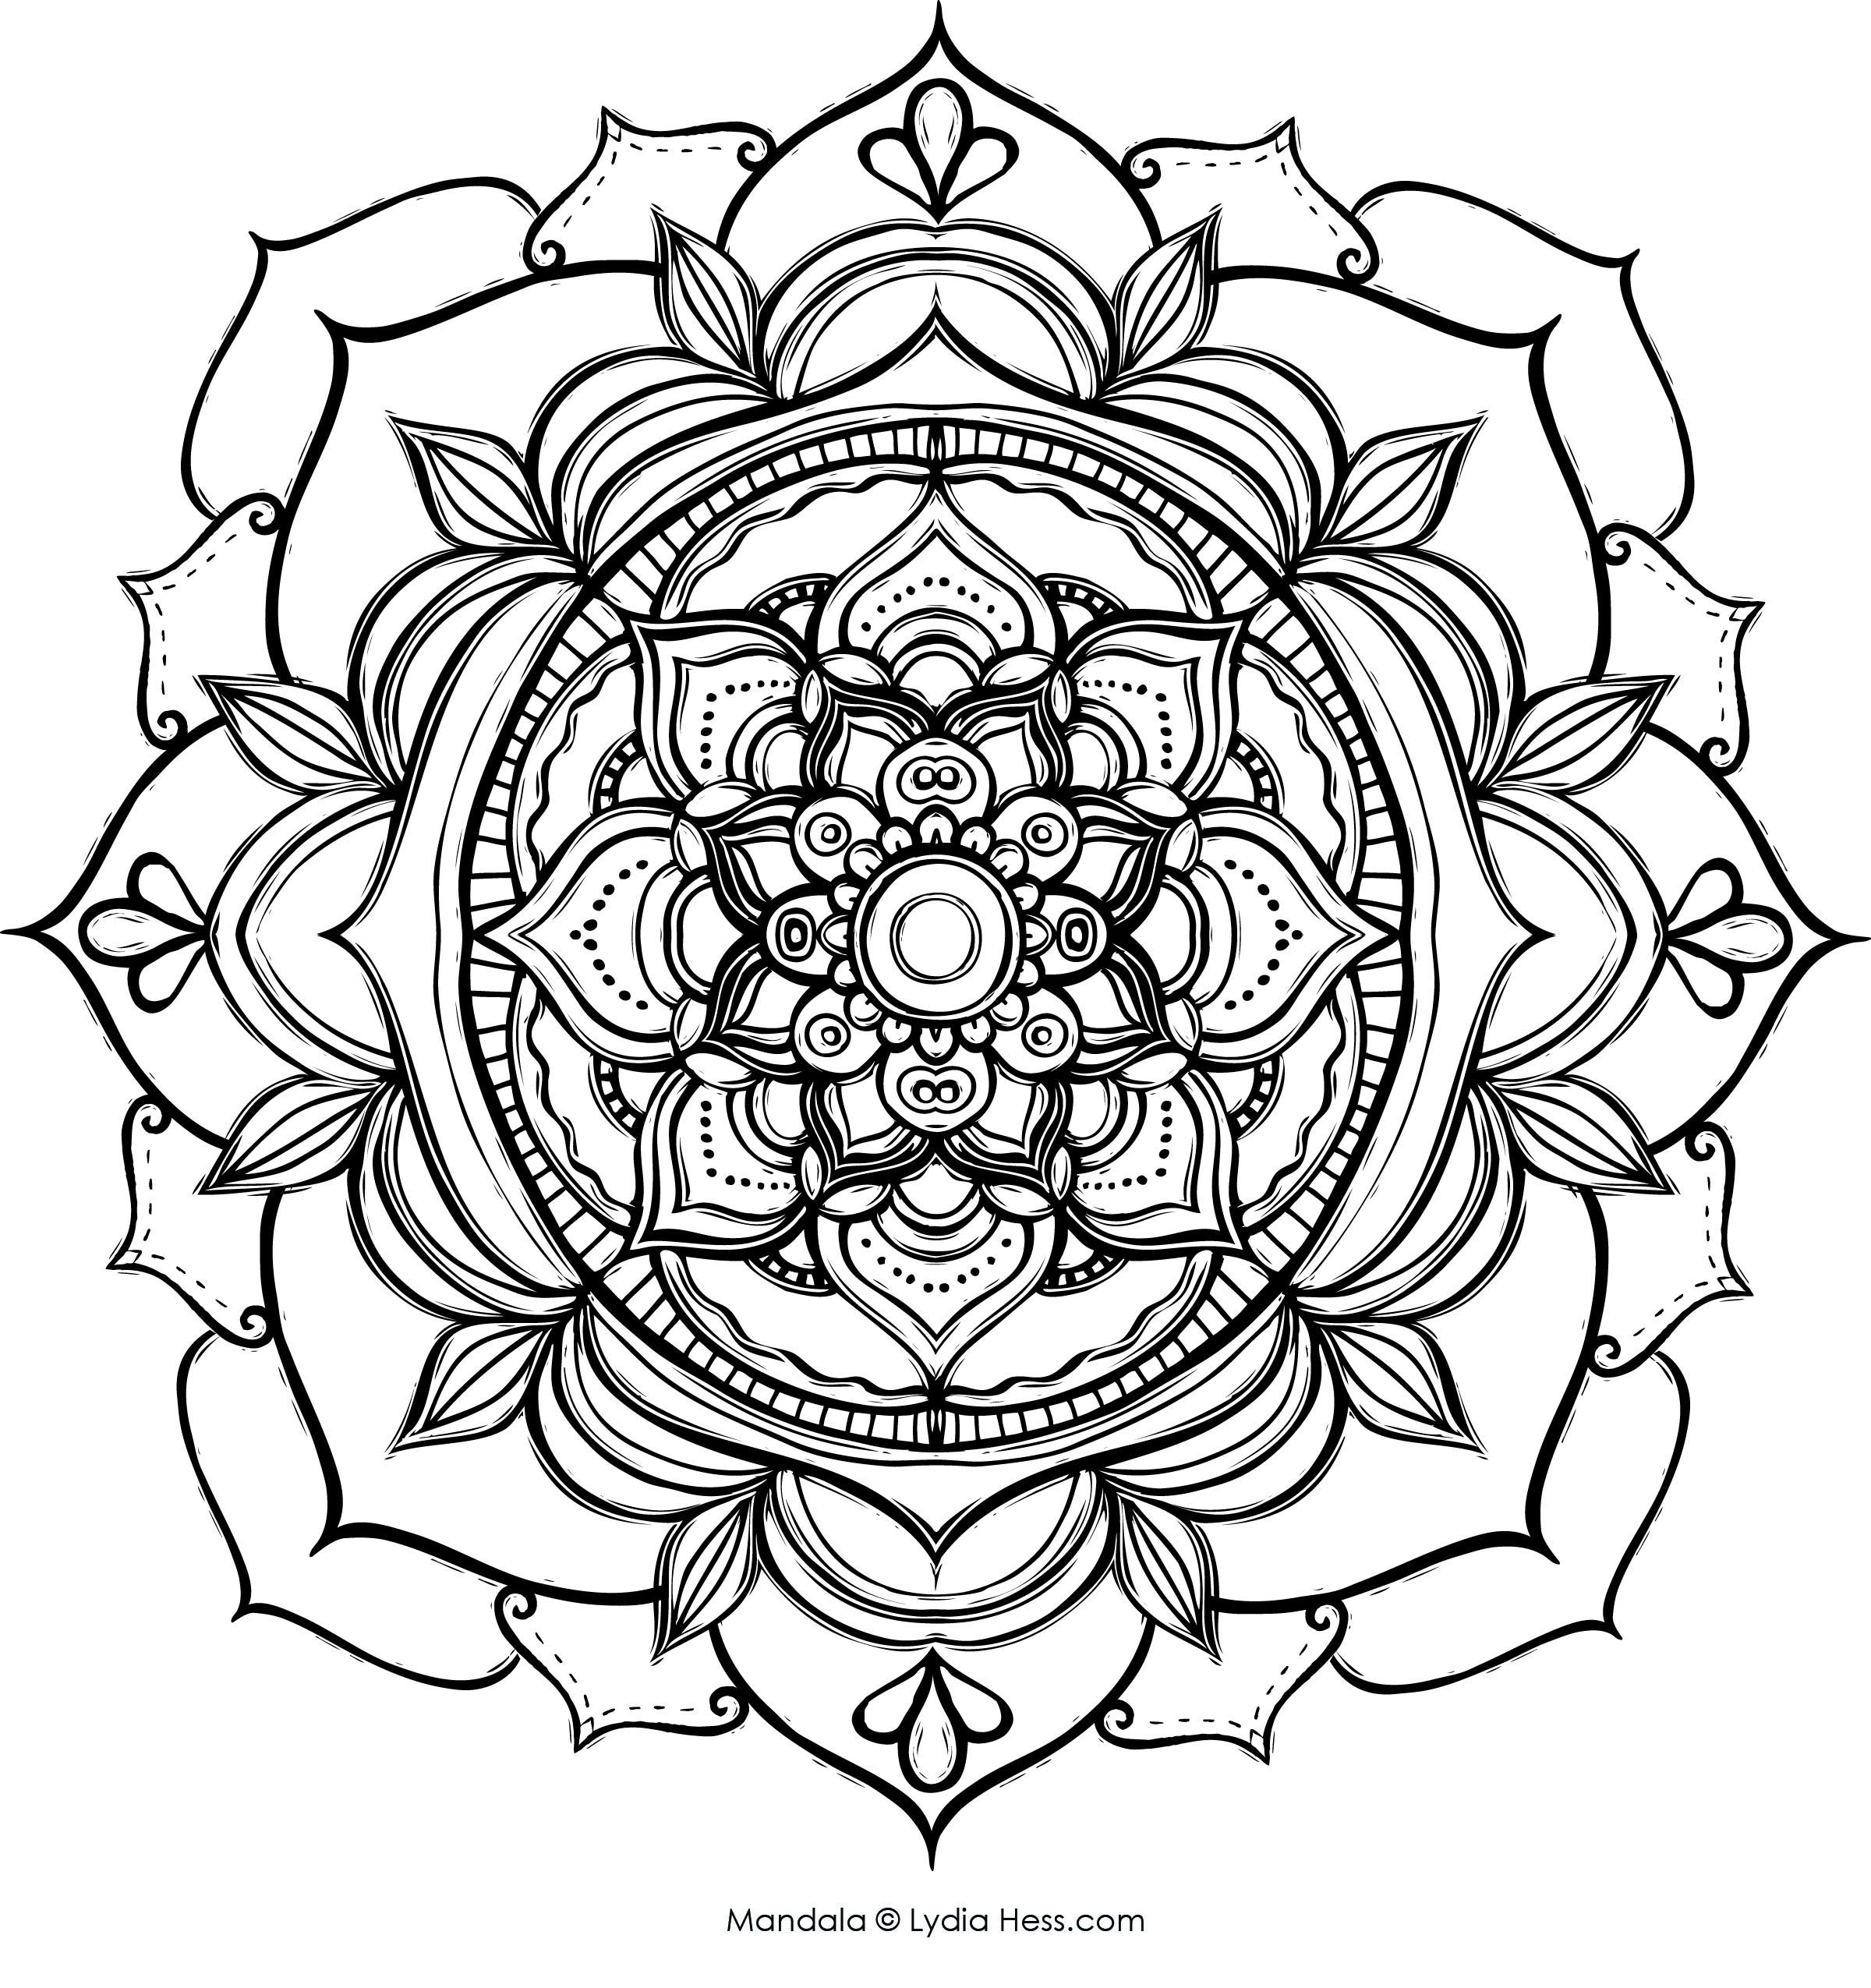 Coloring Pages Mandala Lydia Hess Illustration Design